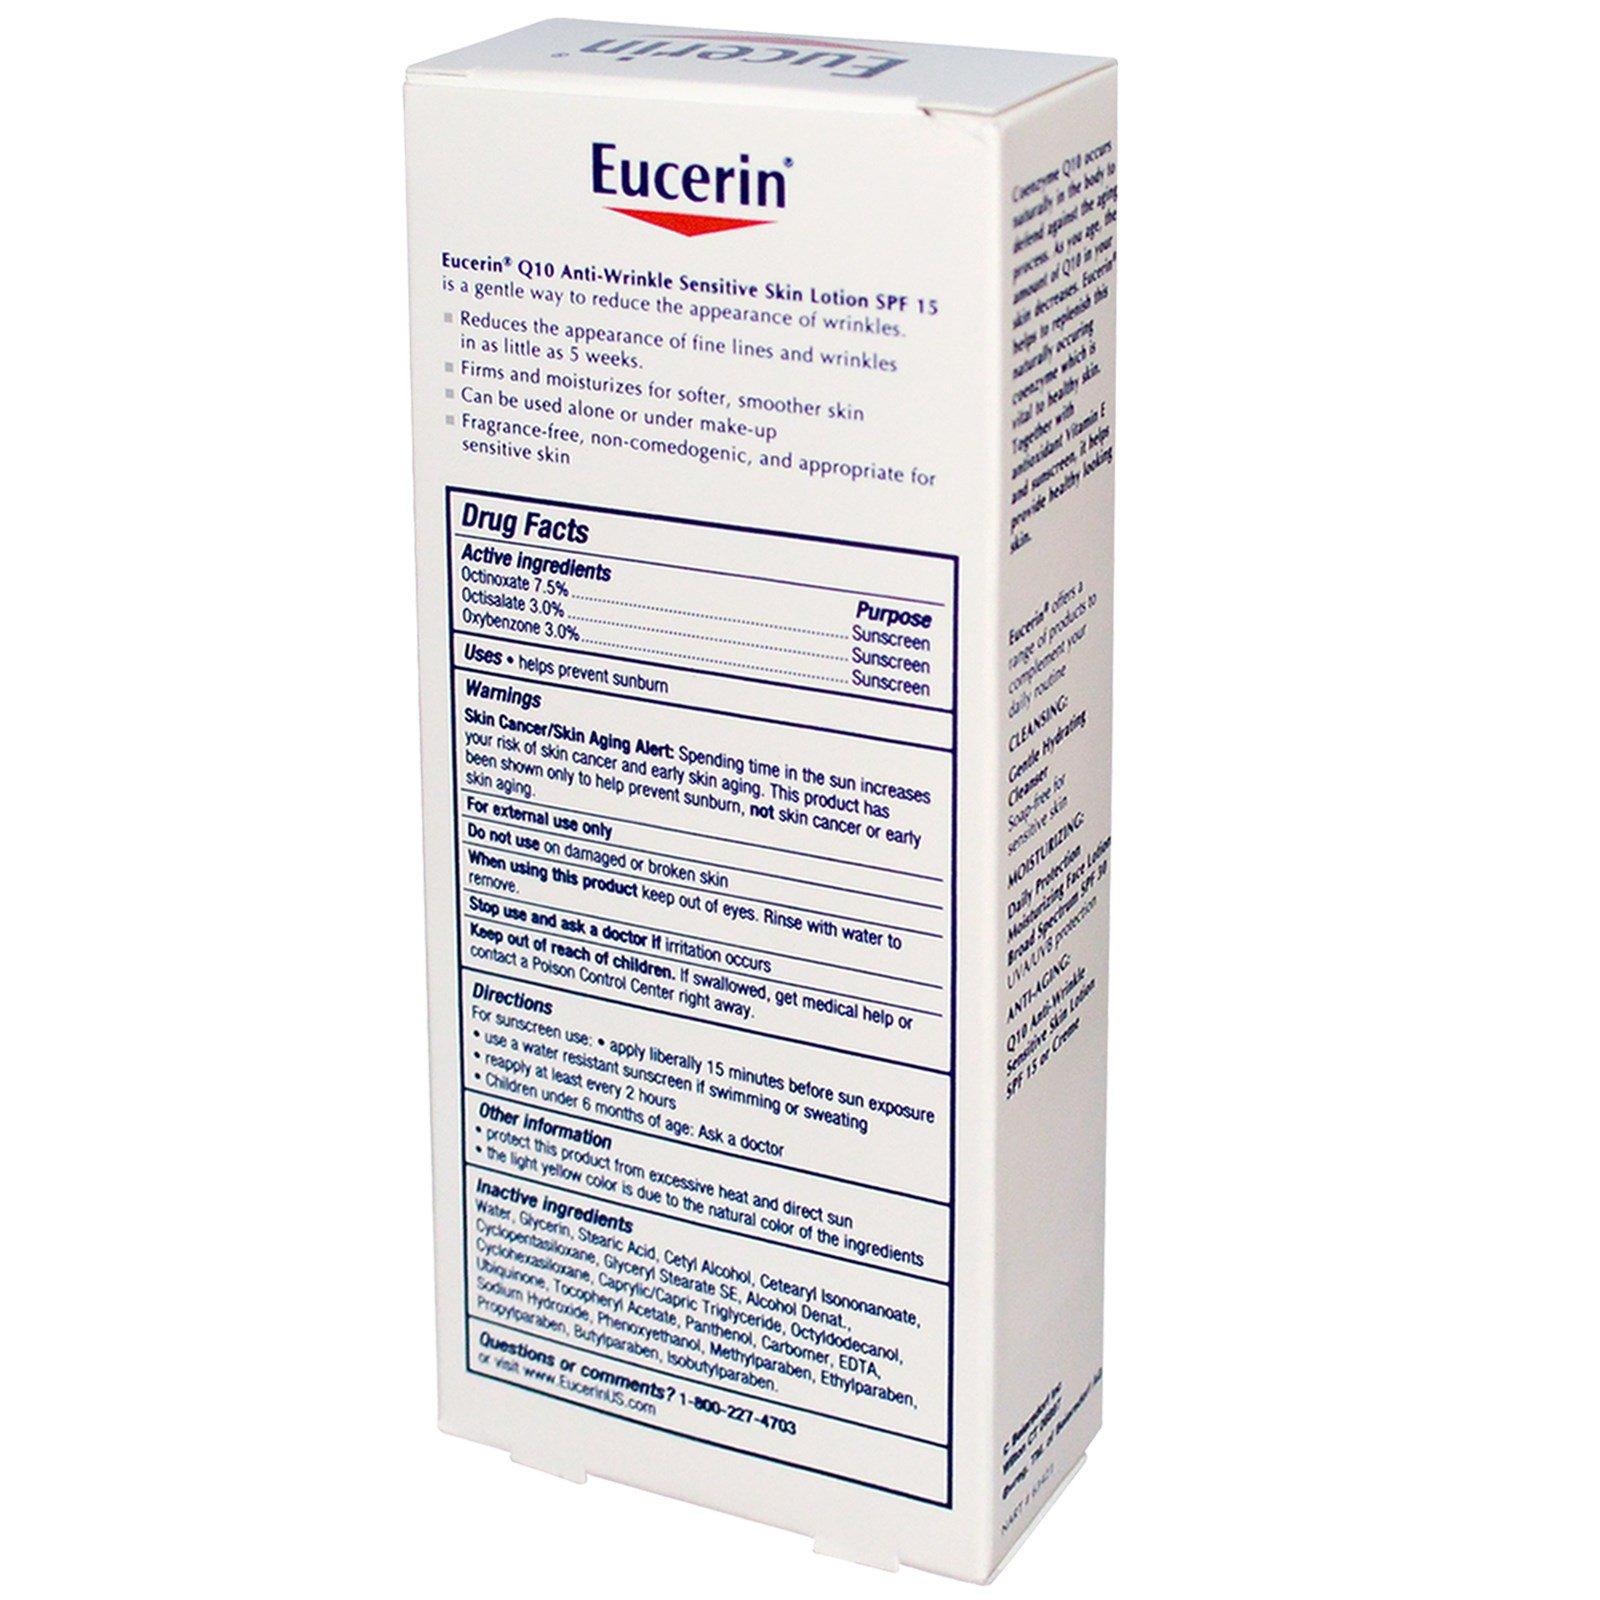 Eucerin, Q10 Anti-Wrinkle Sensitive Skin Lotion, SPF 15 Sunscreen, 4